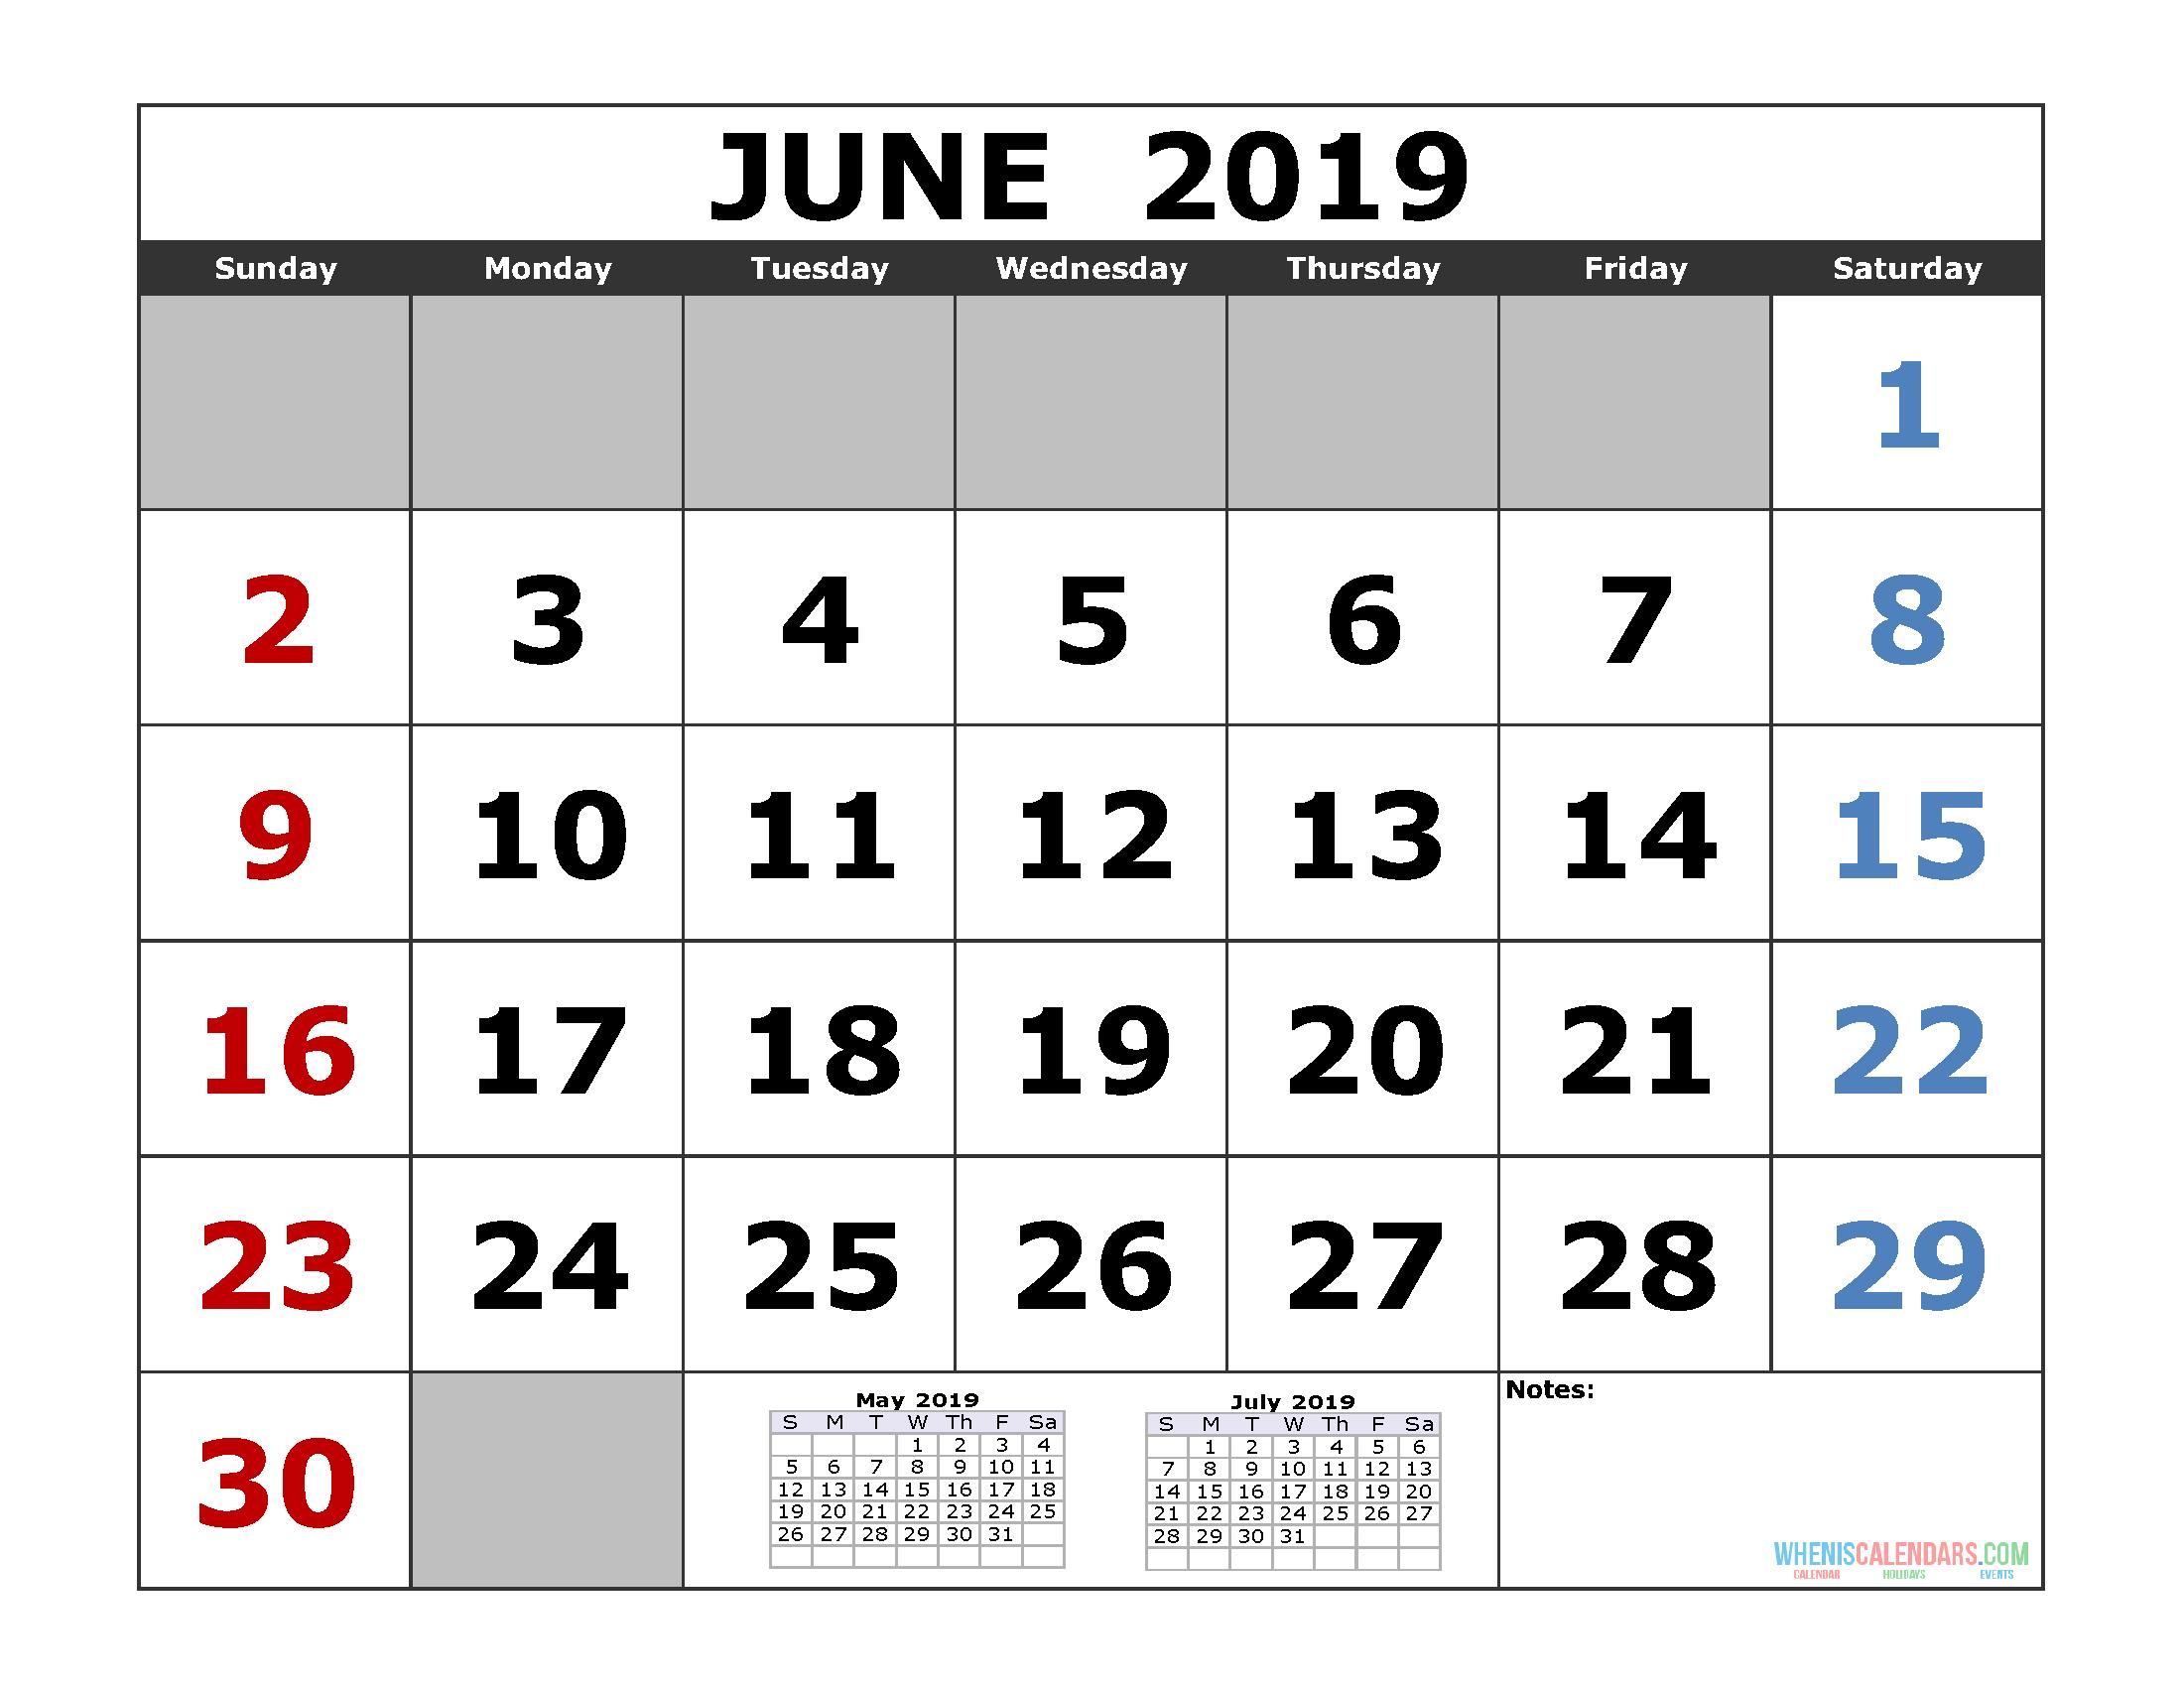 Free June 2019 Printable Calendar Templates [Us. Edition]   Free June 4 2019 Calendar